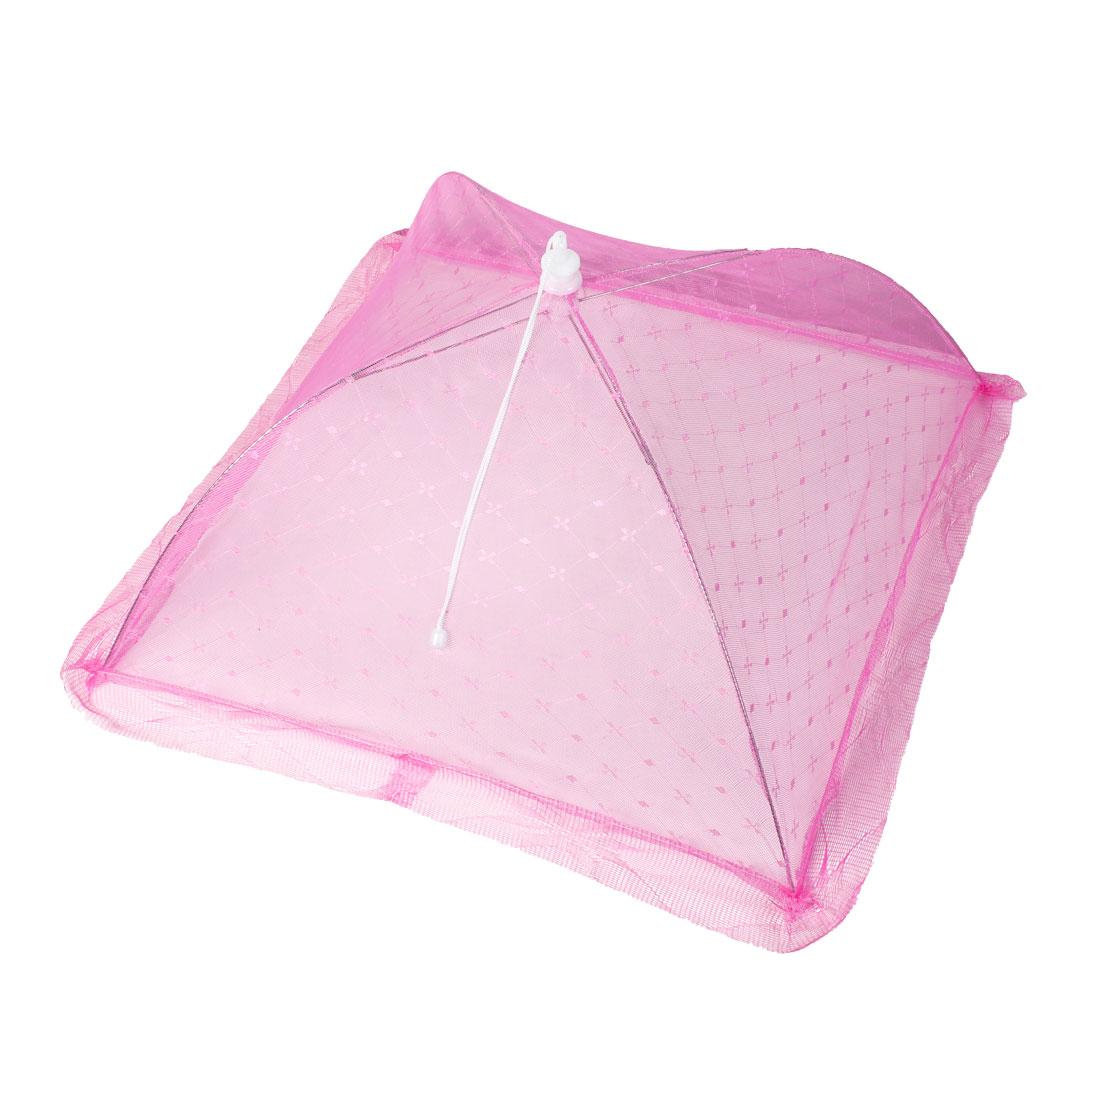 54cm x 54cm Camping Picnic Folding Anti-mosquito Umbrella Food Cover Pink